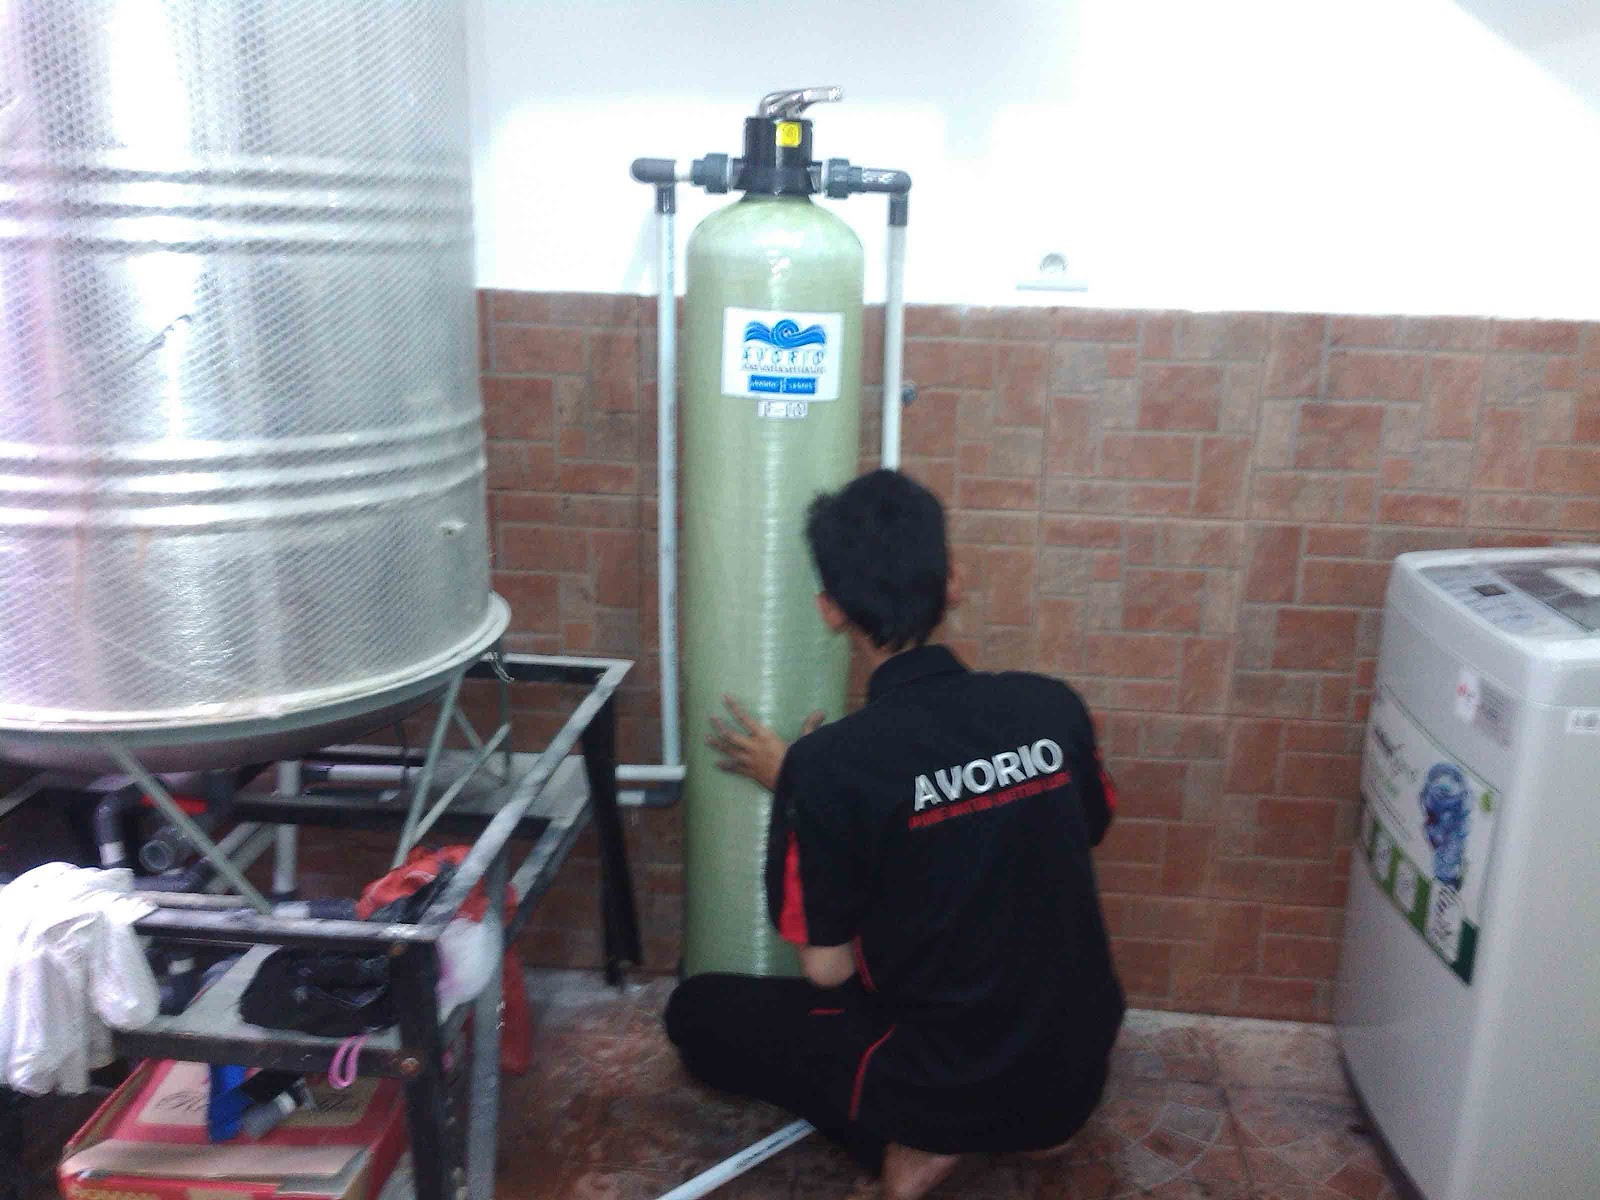 filter air fiber, harga jual murah, bergaransi, kualitas ok, air tanah sumur bor